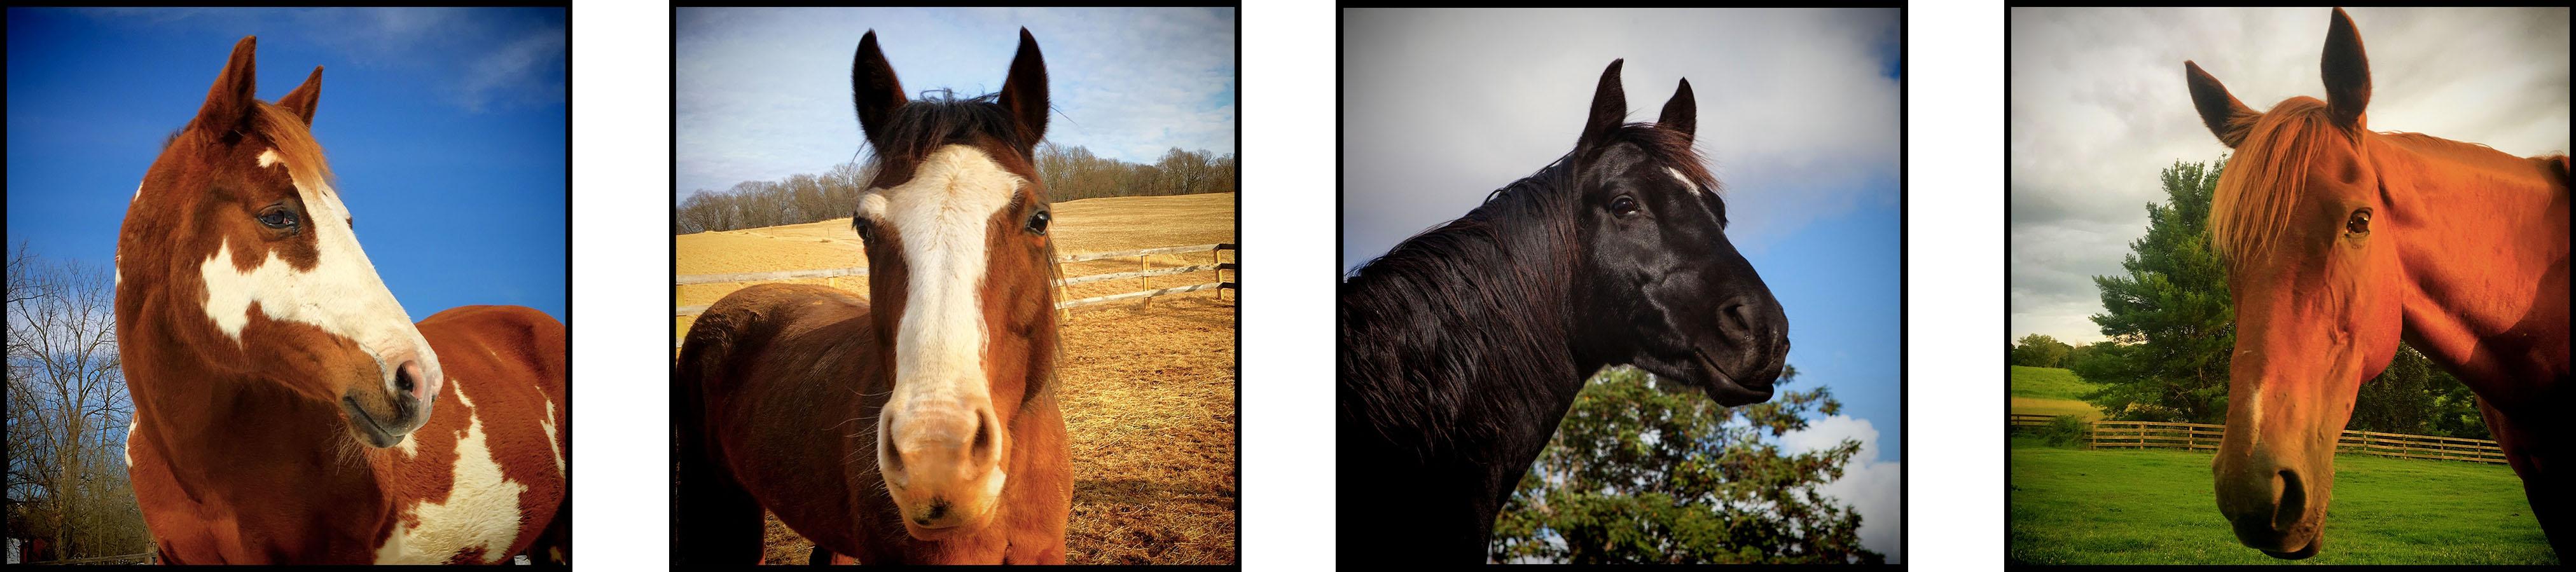 4 Horse Portraits